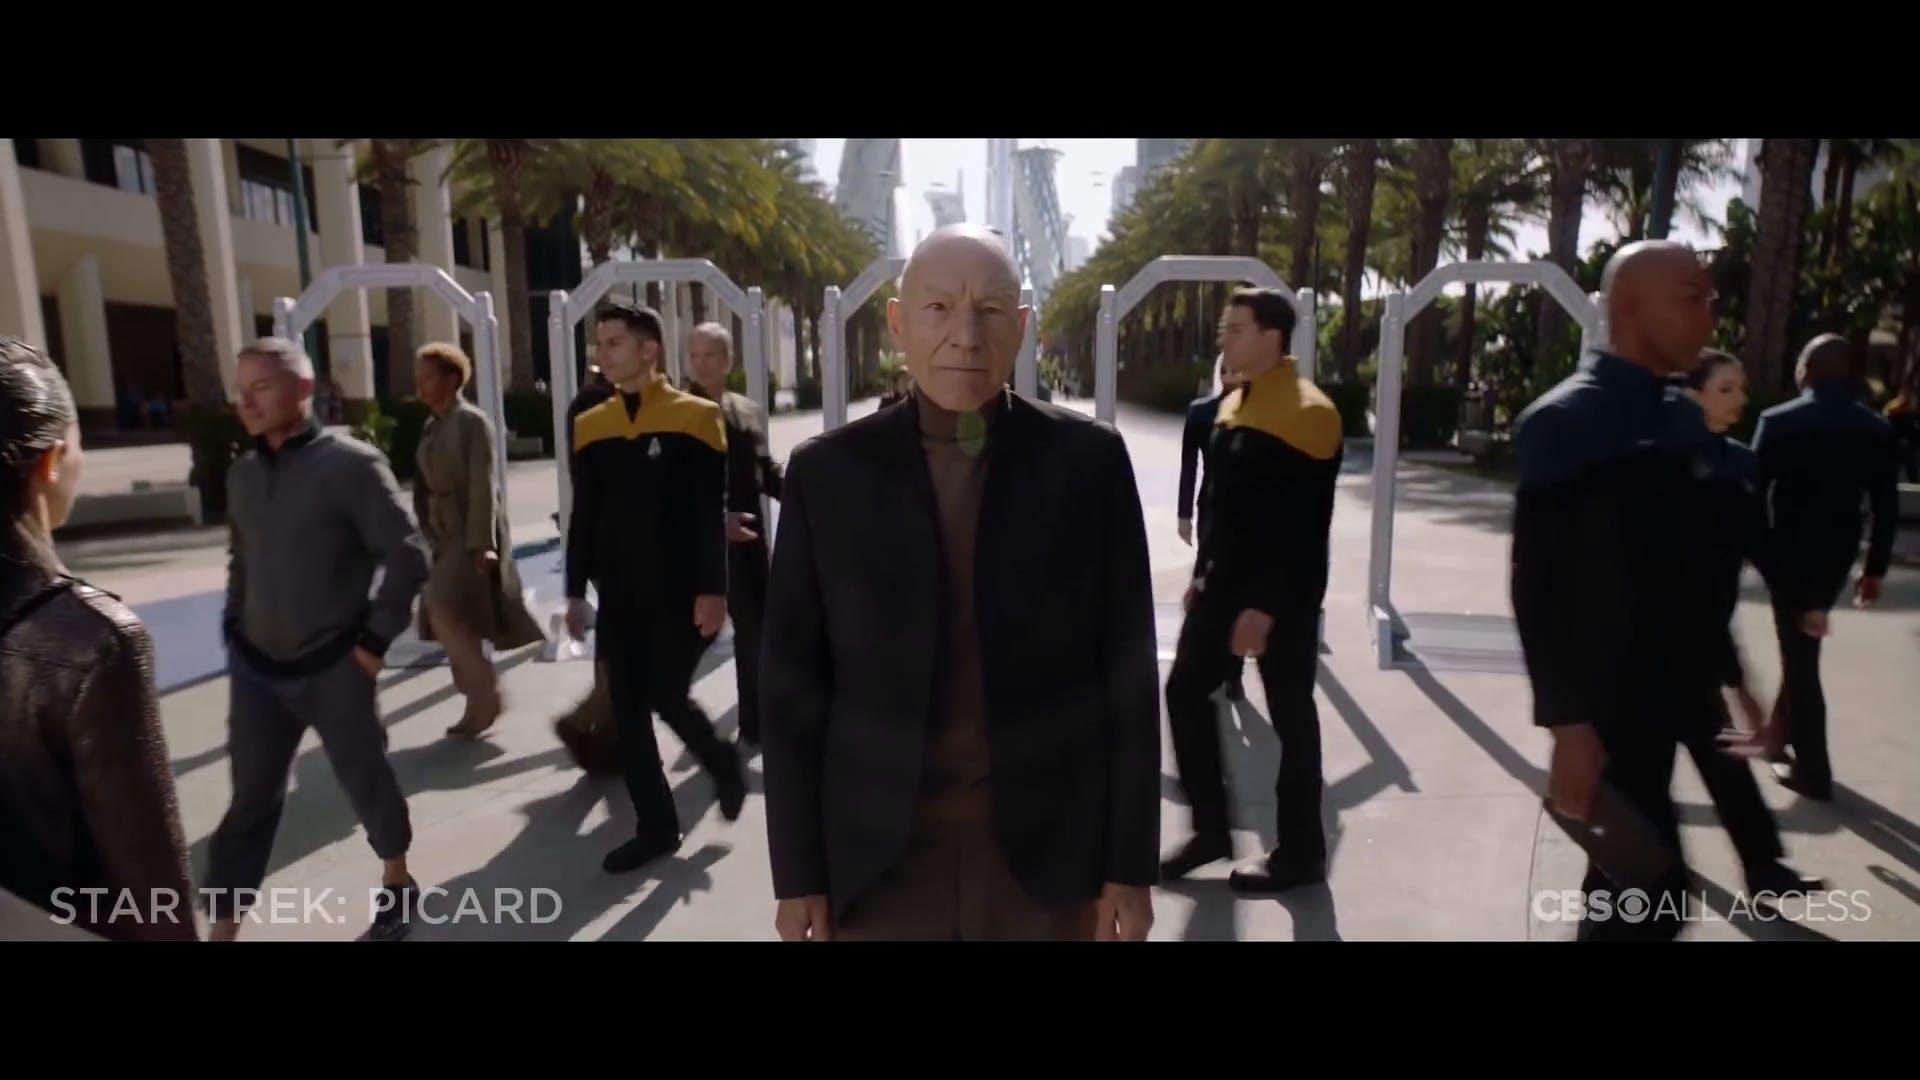 Star Trek: Picard cast